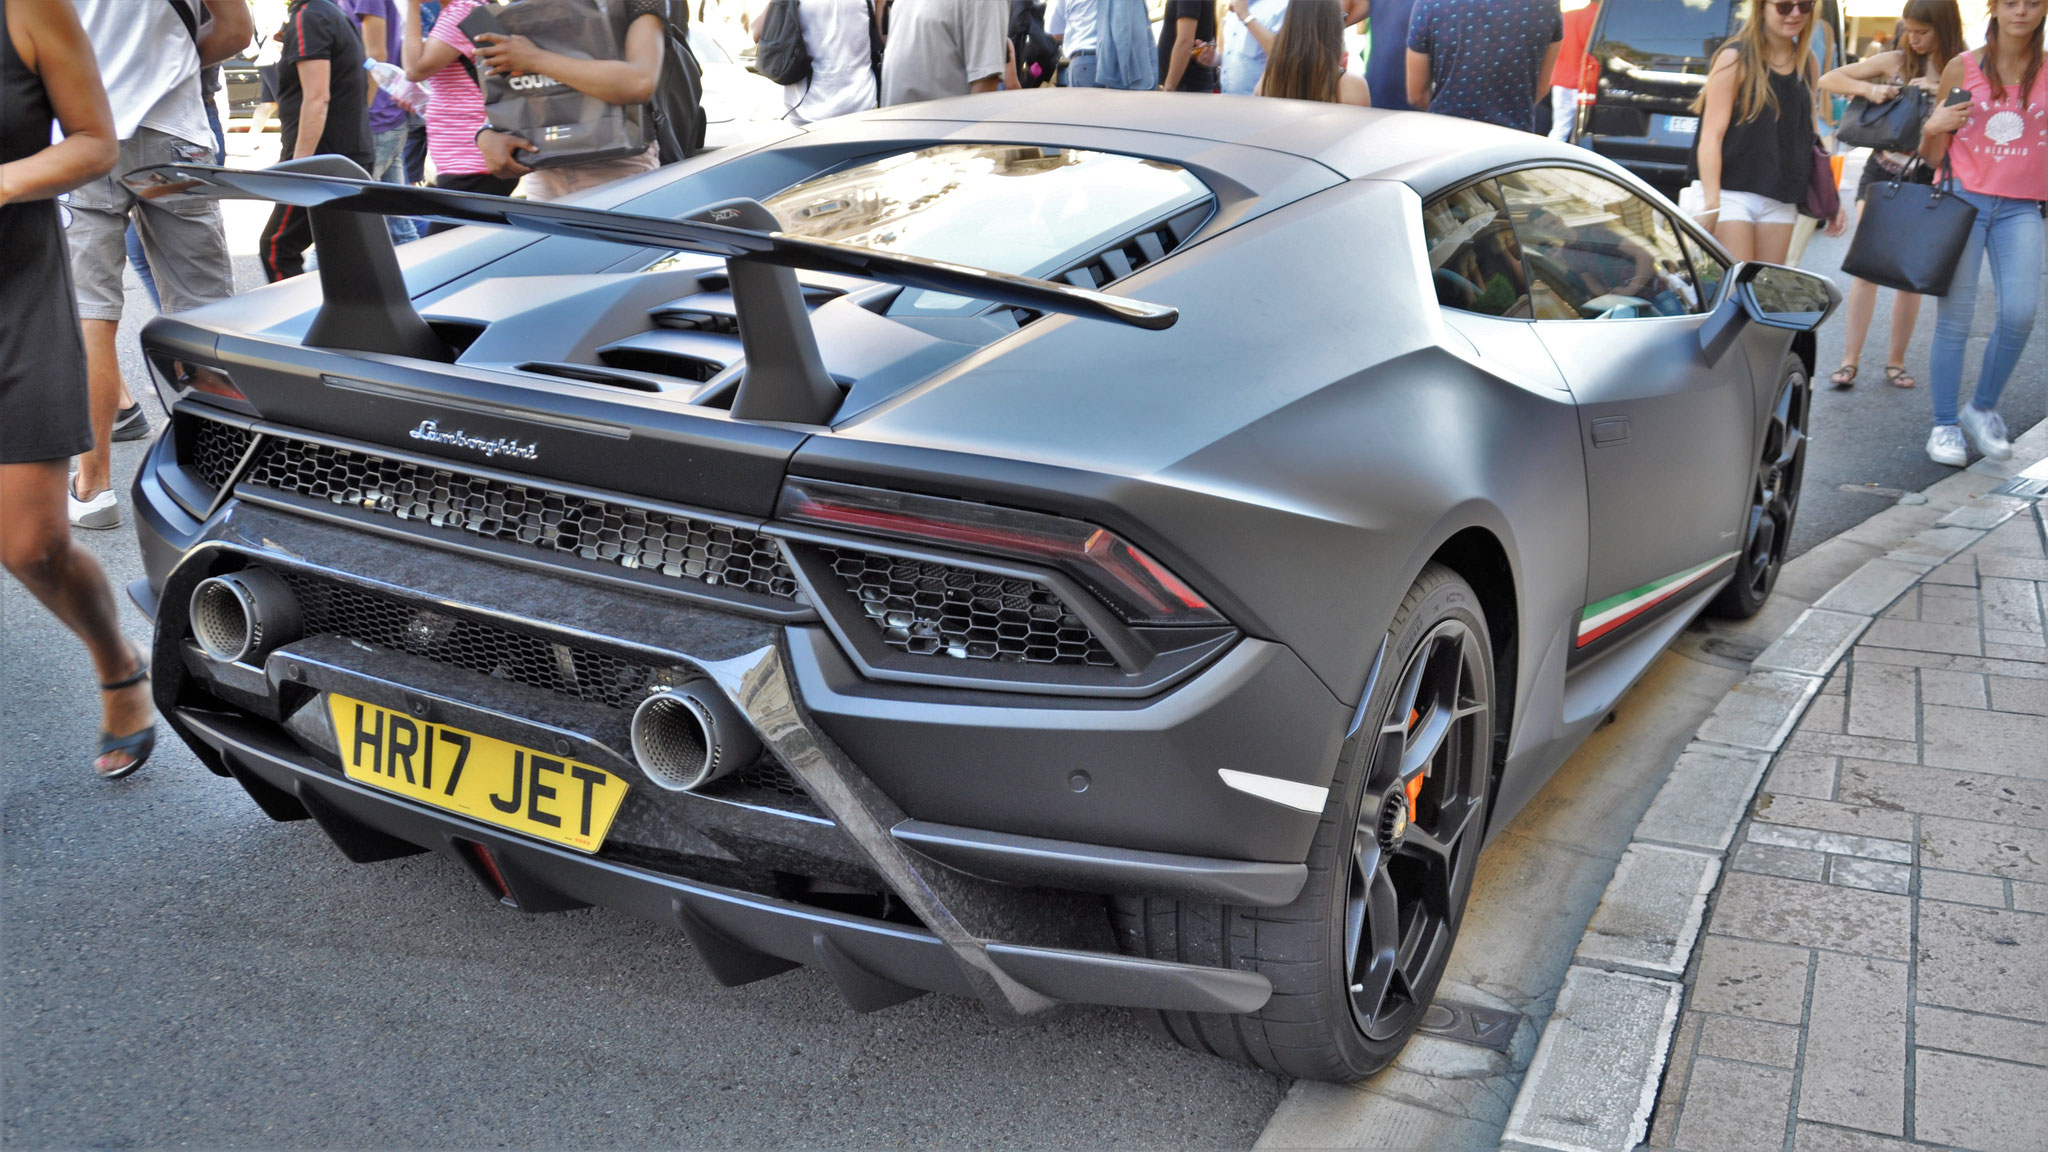 Lamborghini Huracan Performante - HR17-JET (GB)